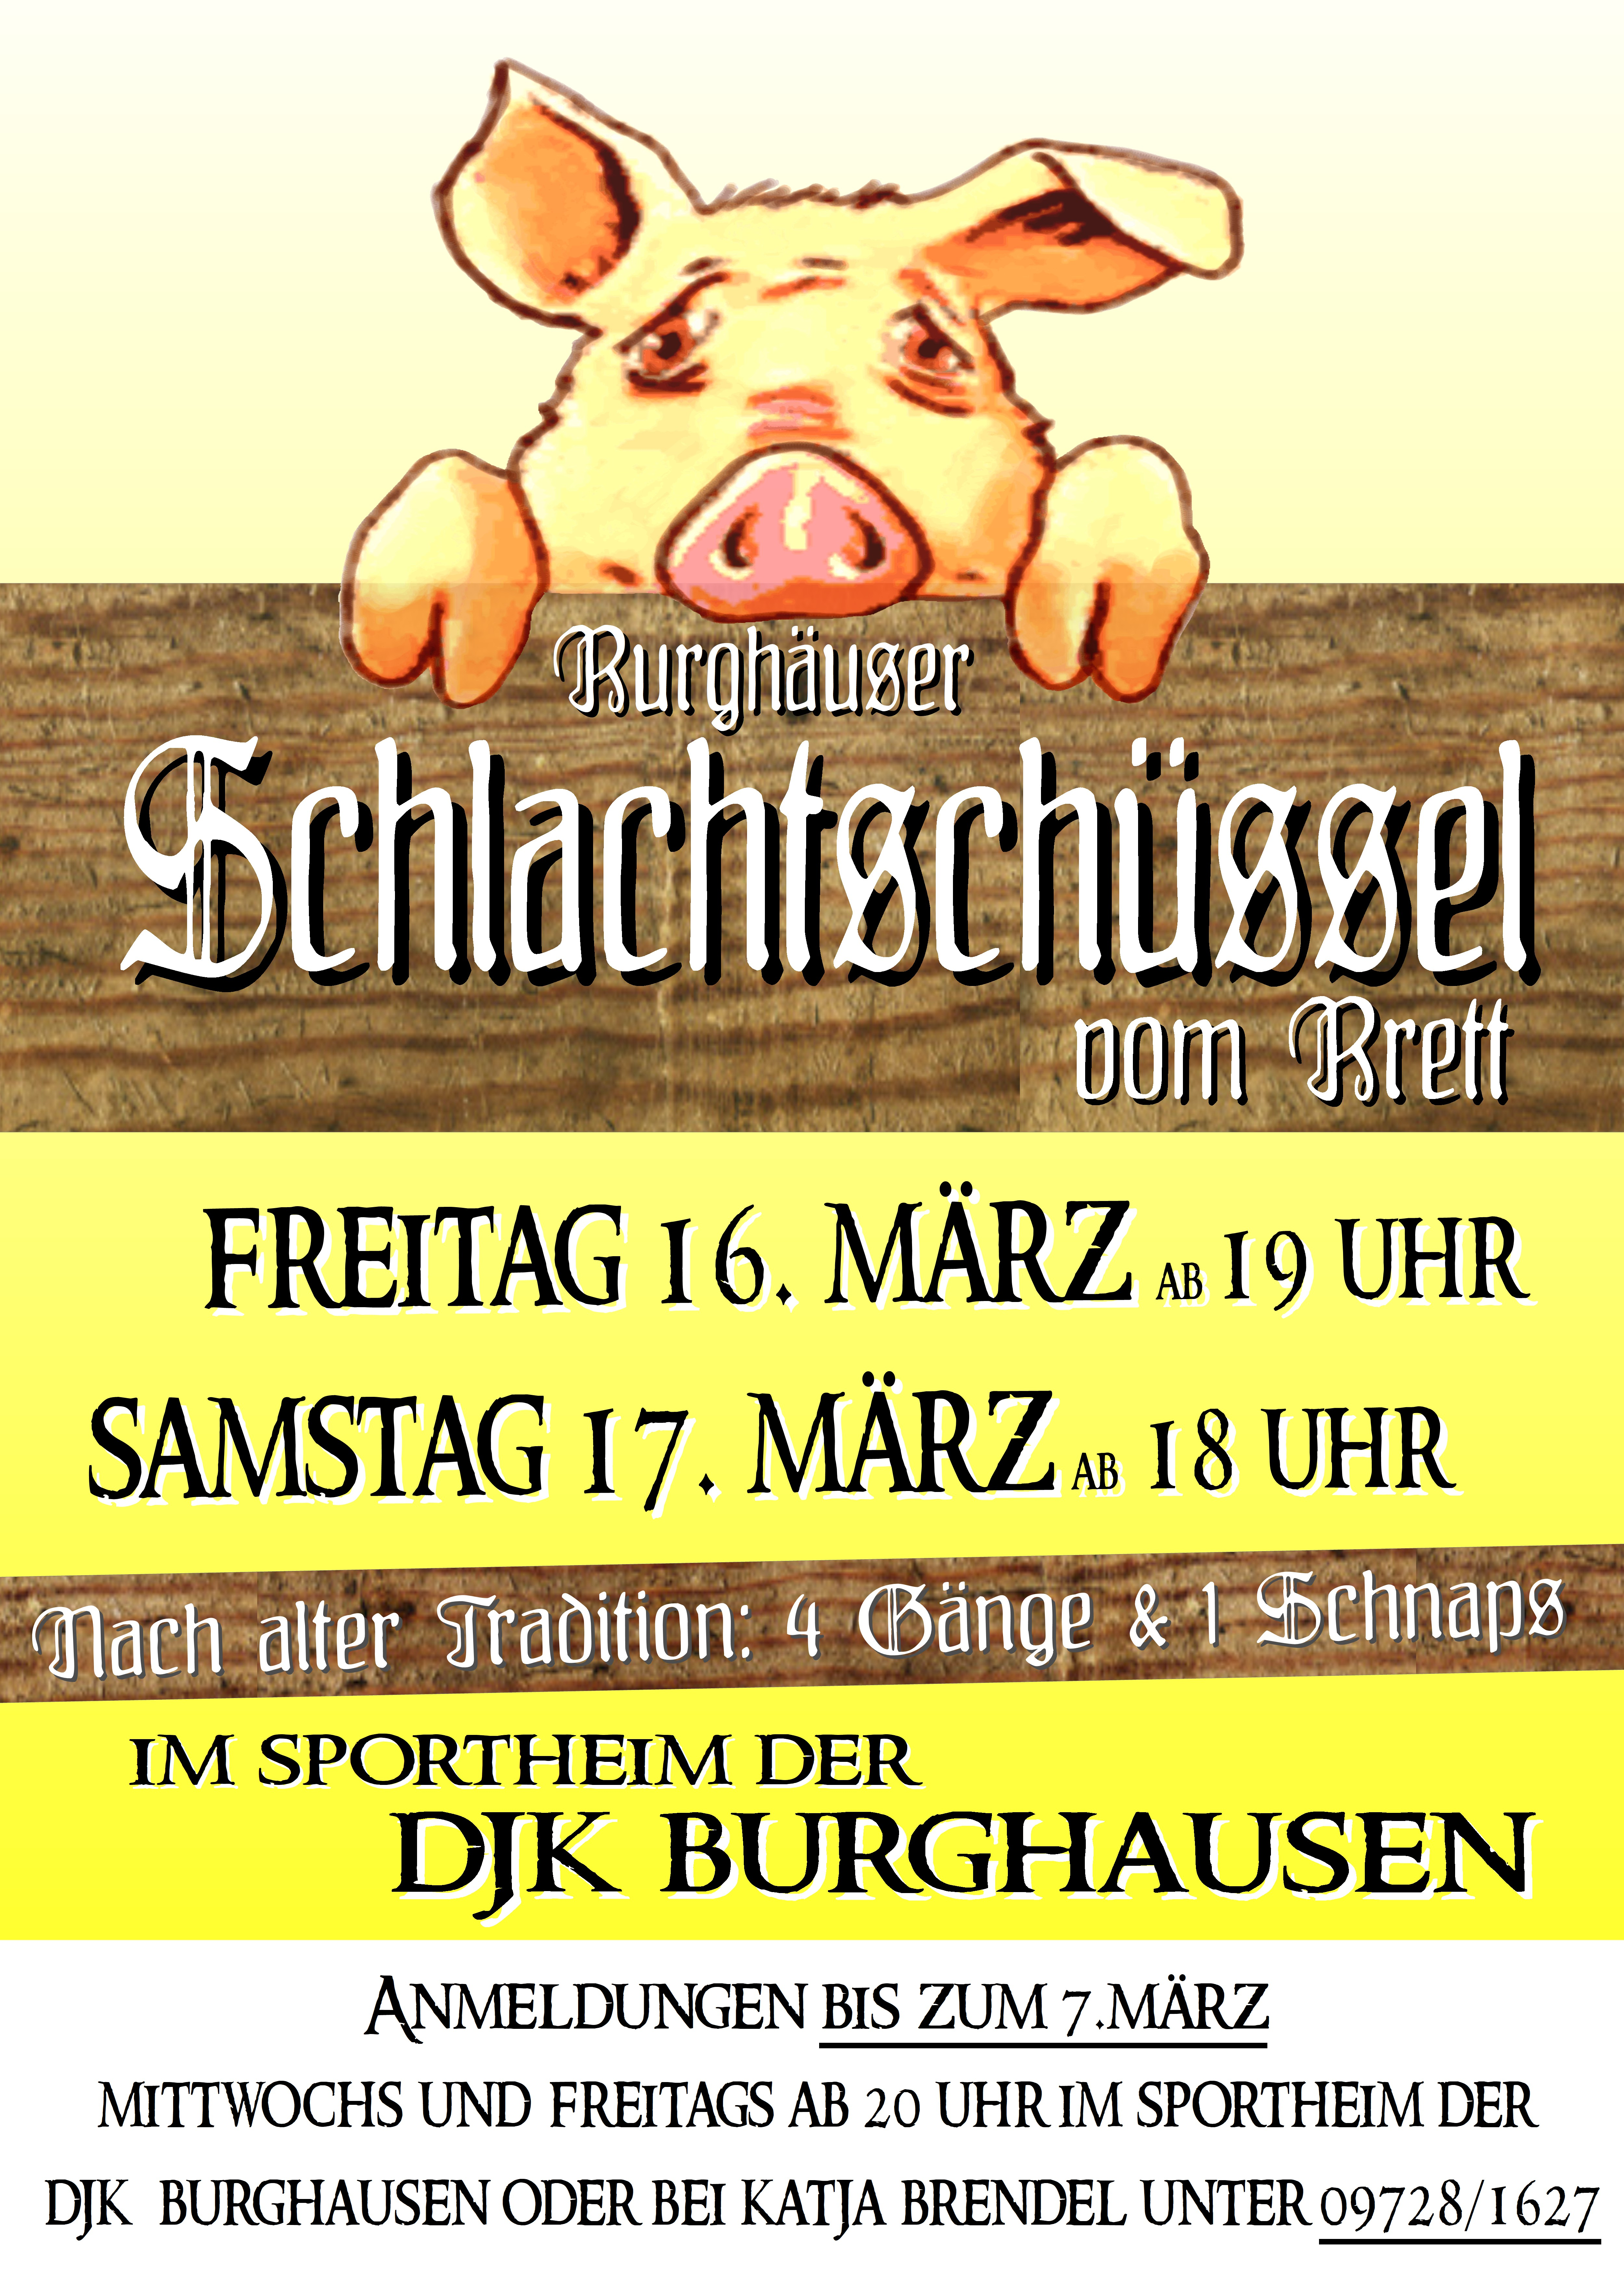 Burghaeuser Schlachtschüssel 2018 – Burghaeuser.de